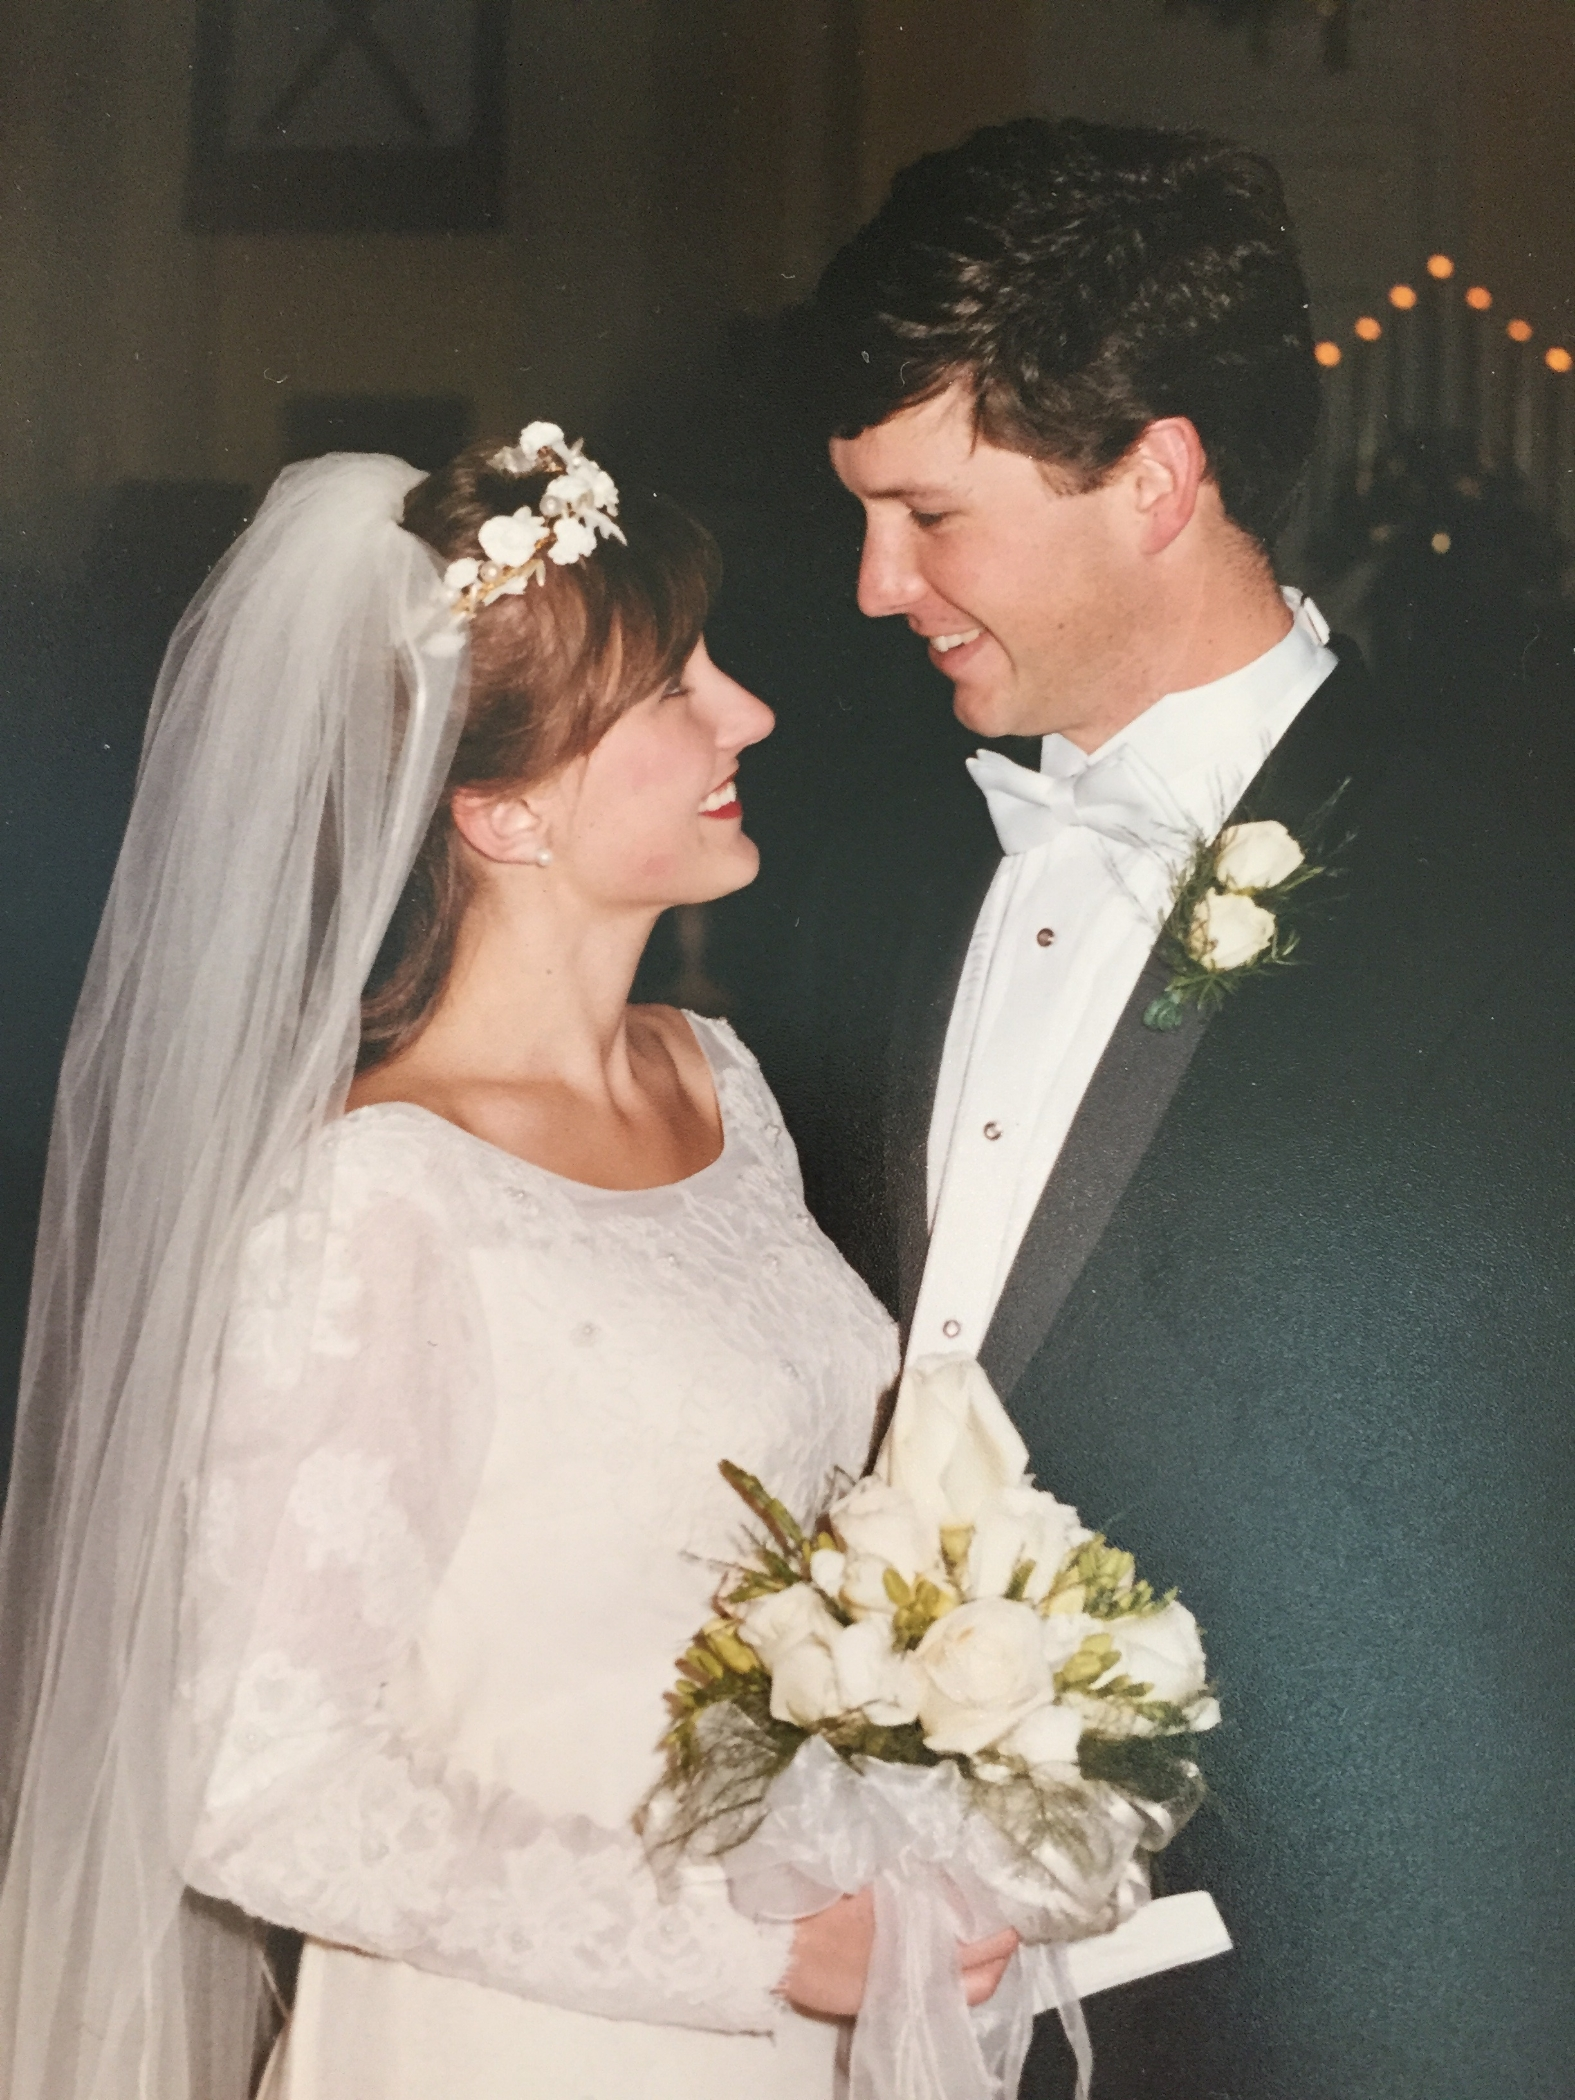 John and my wedding day wearing my mom's wedding dress. December 4, 1999